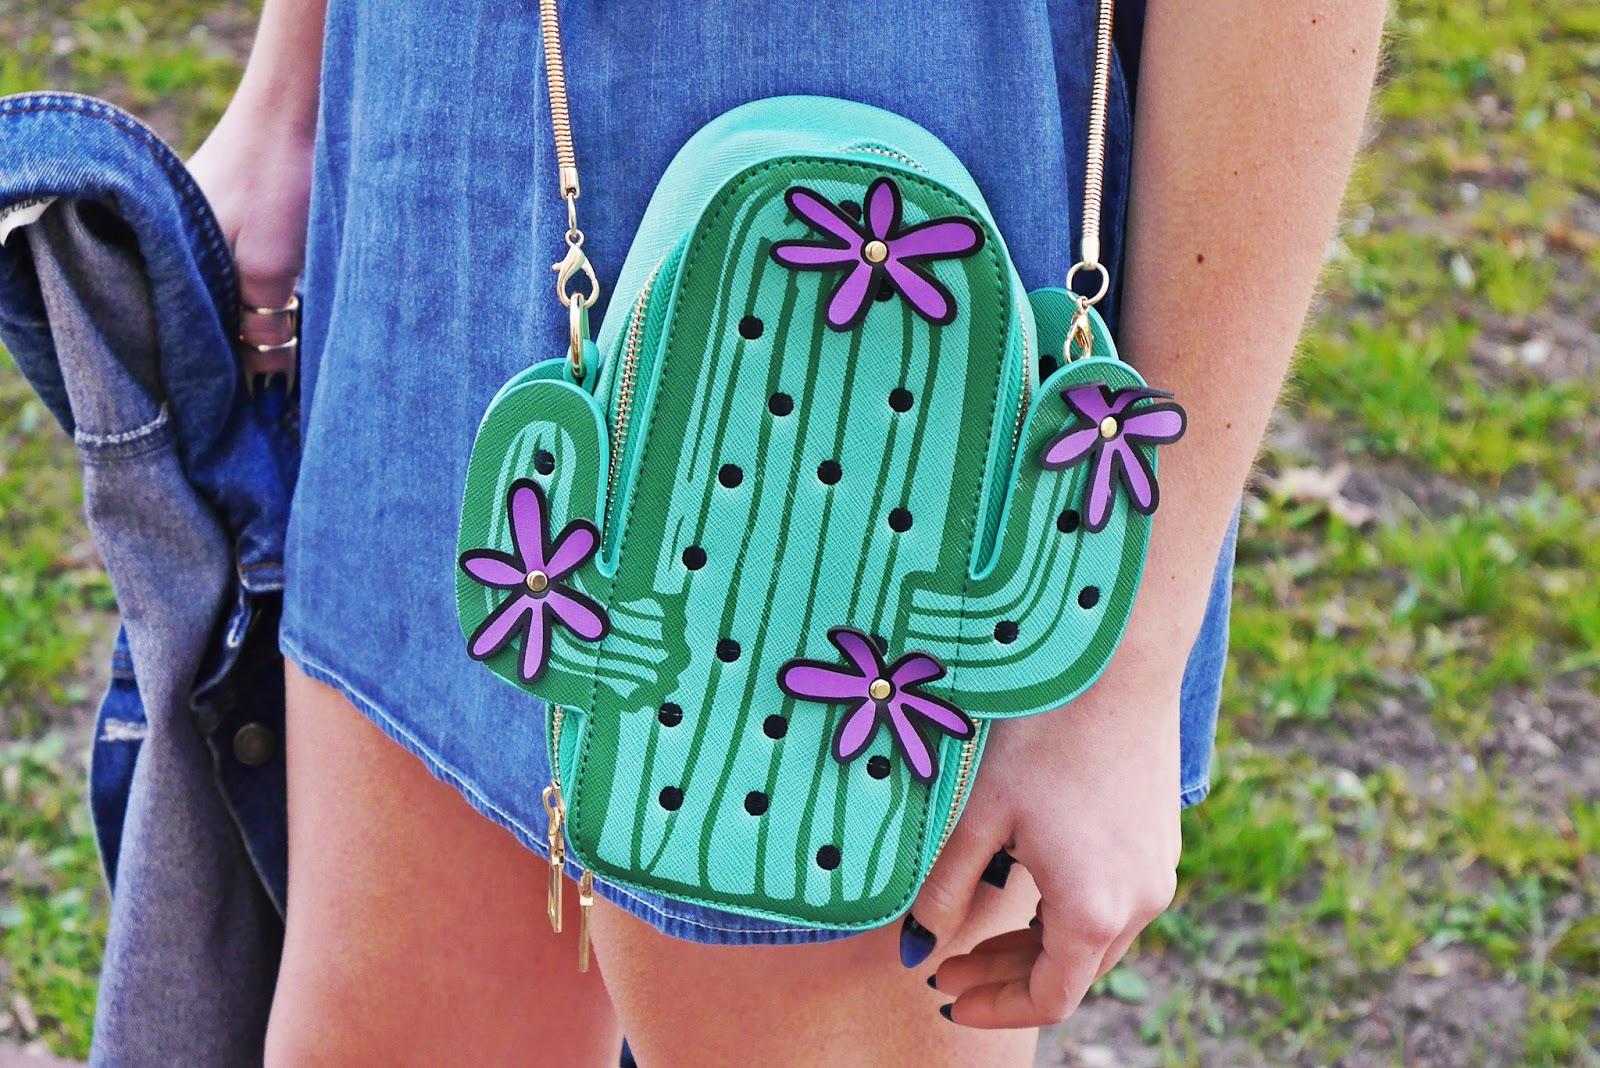 denim_dress_cactus_bag_zaful_sammydress_karyn_look_ootd_outfit_120417f